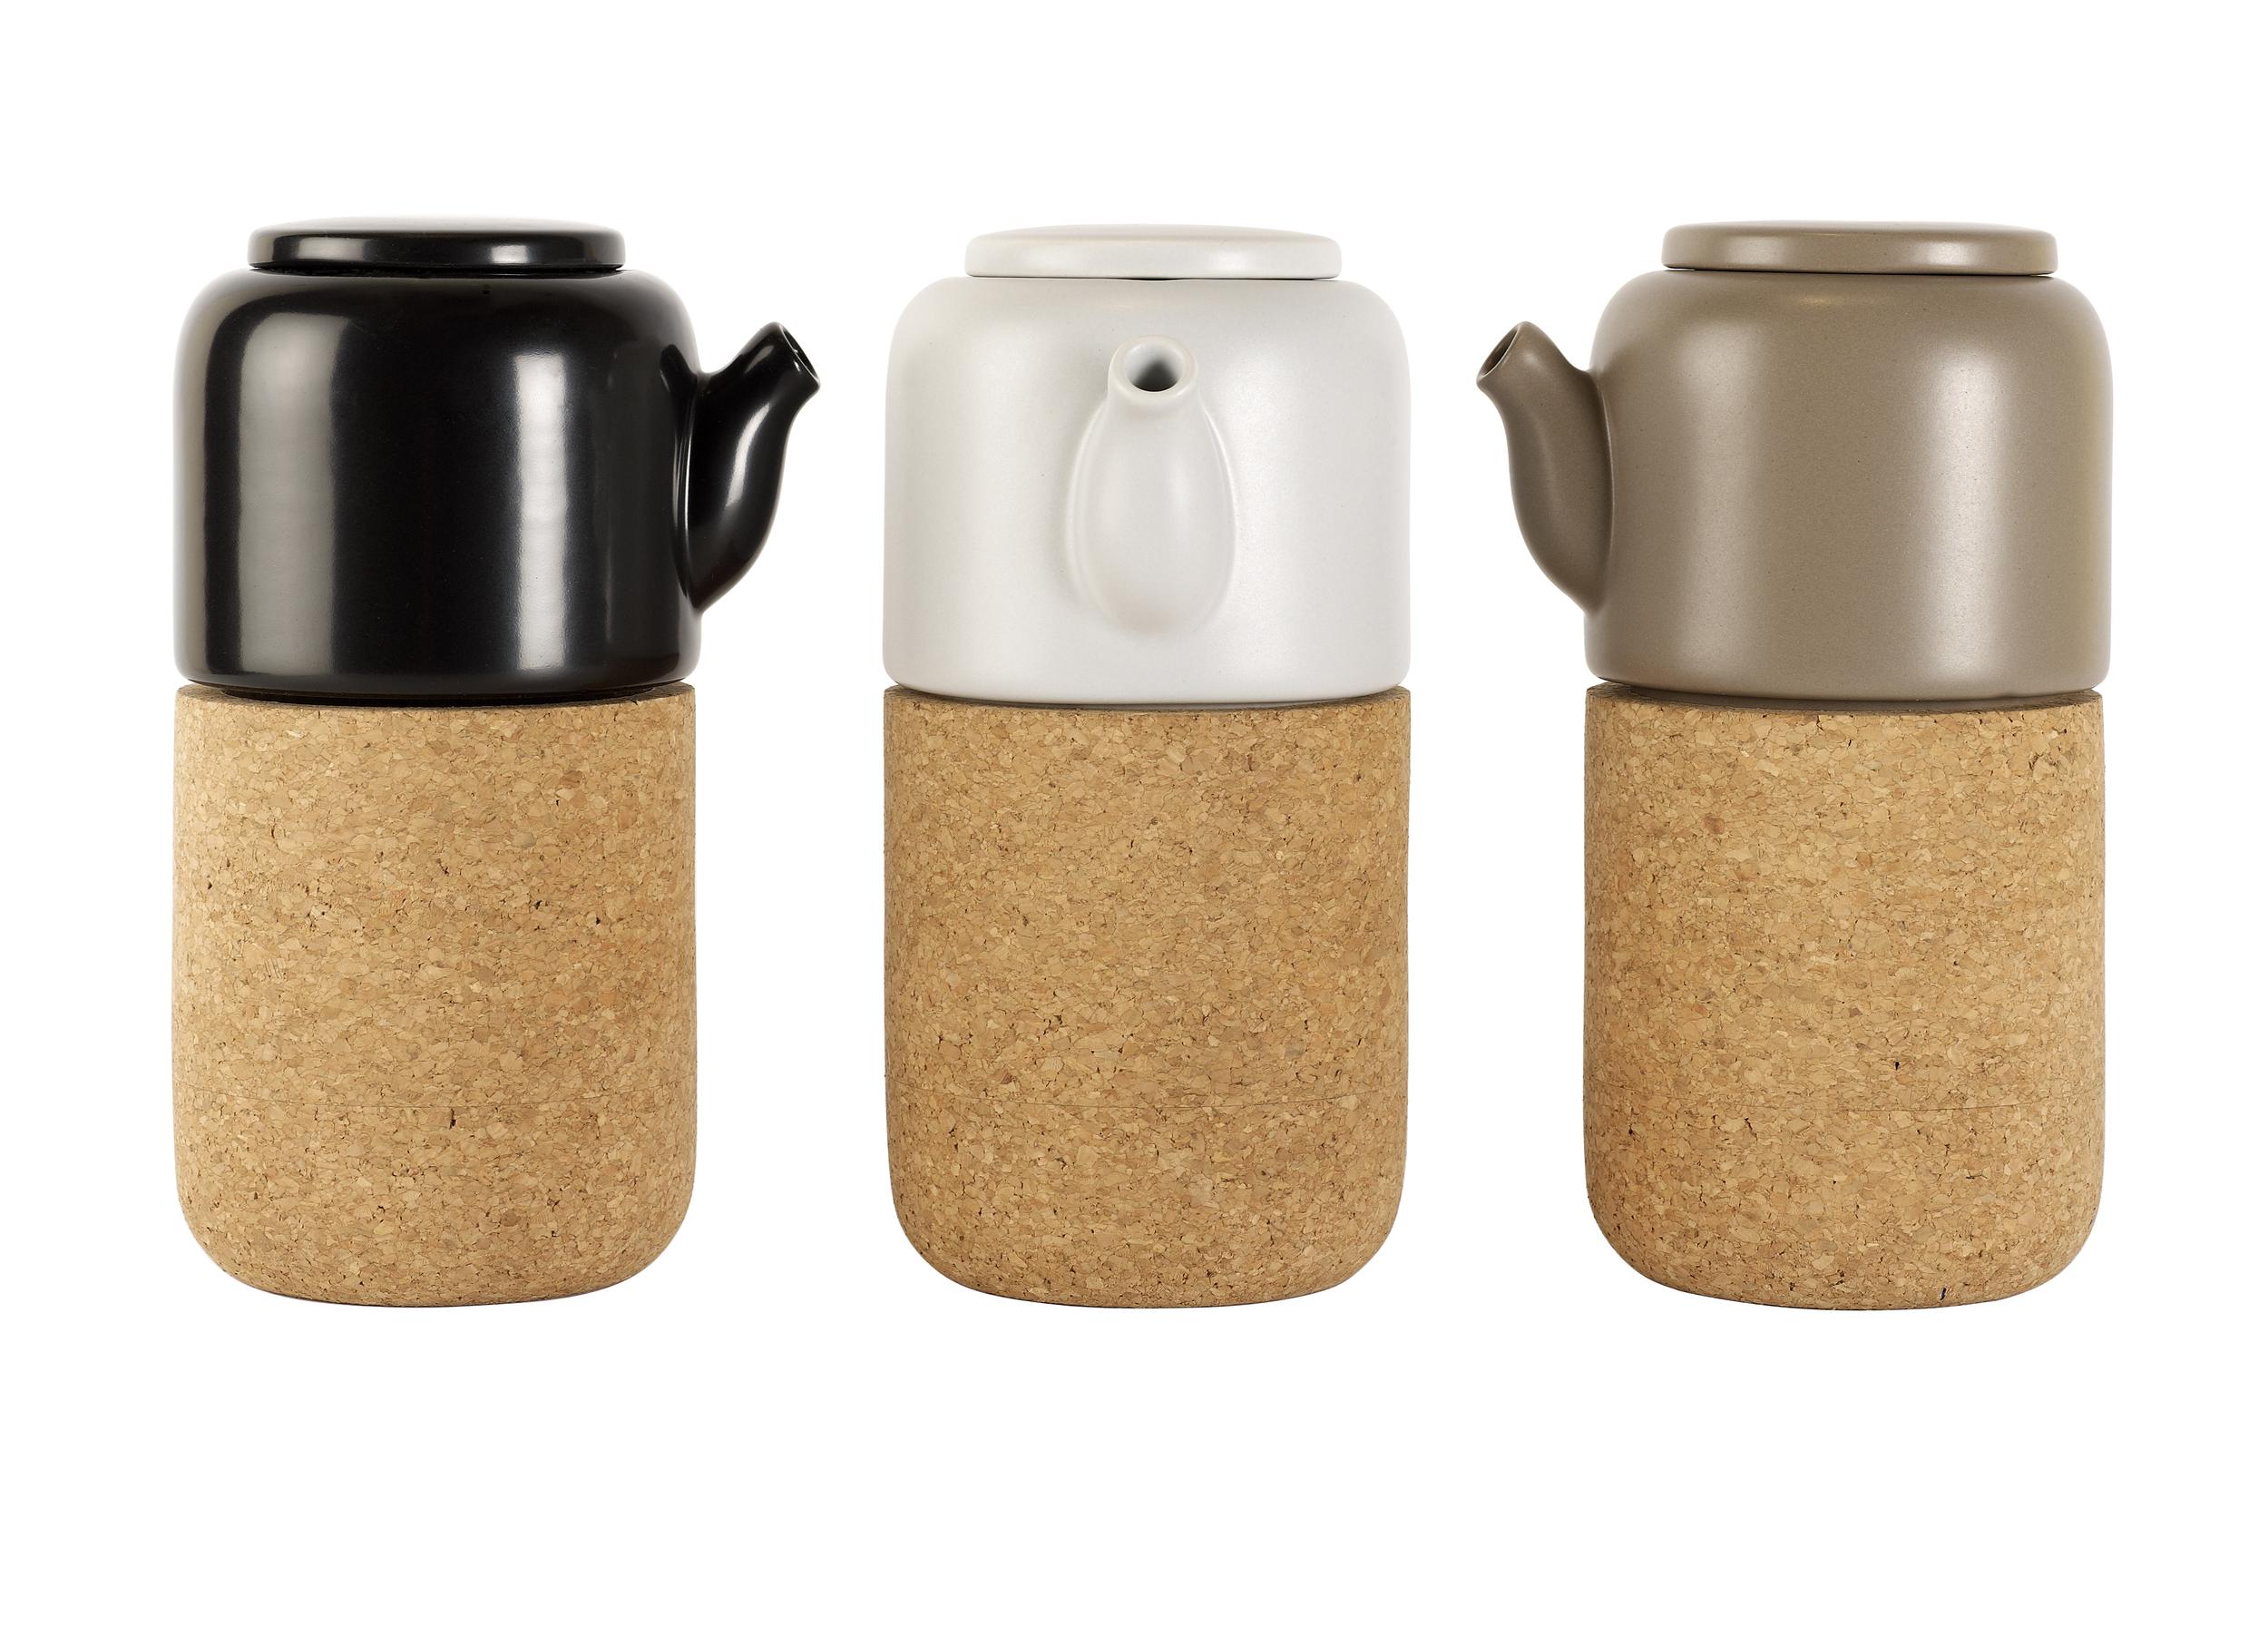 'Nomu' teapots by Lee West for ENOstudio, £62.80   madeindesign.co.uk